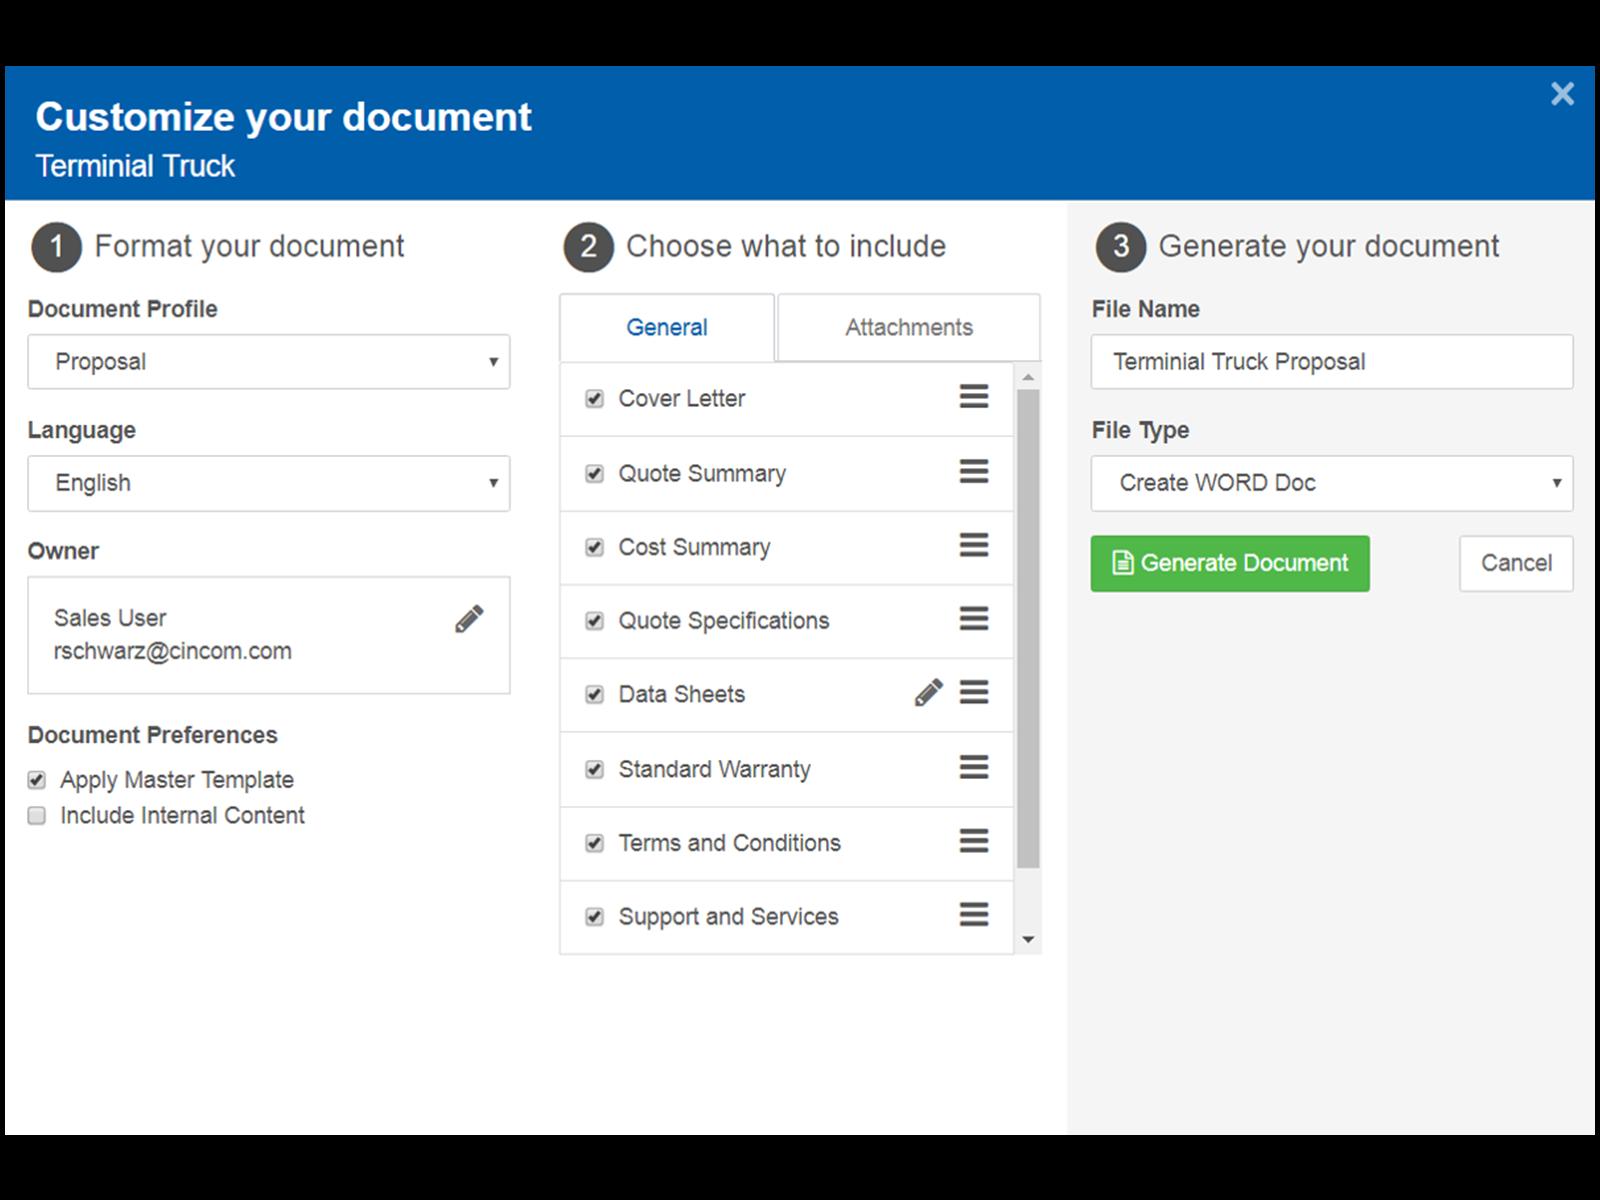 Customize documents